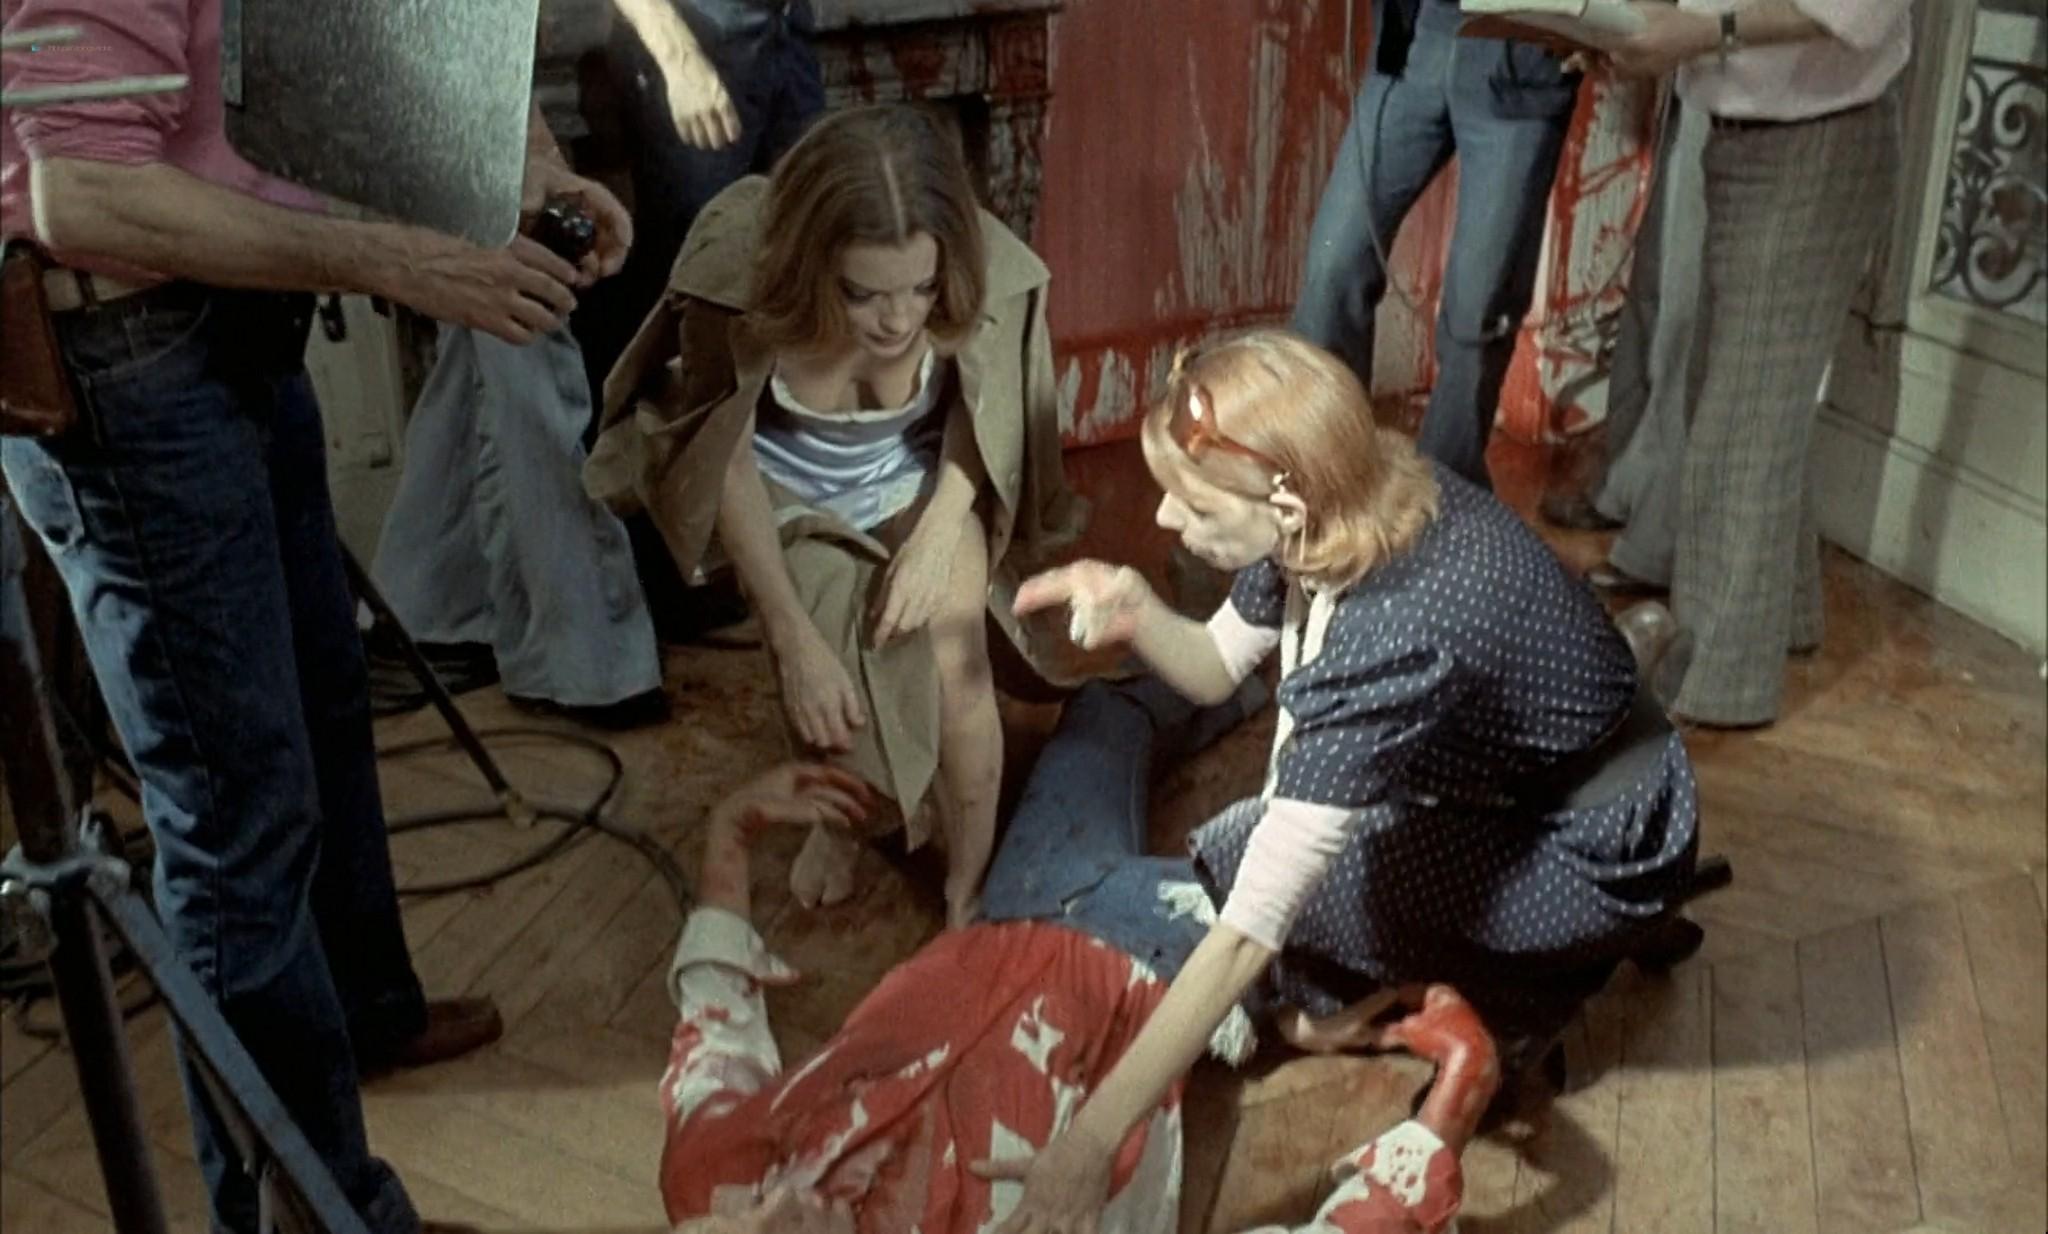 Romy Schneider nude butt Nadia Vasil bush others orgy - L'important c'est d'aimer (FR-1975) HD 1080p BluRay (18)